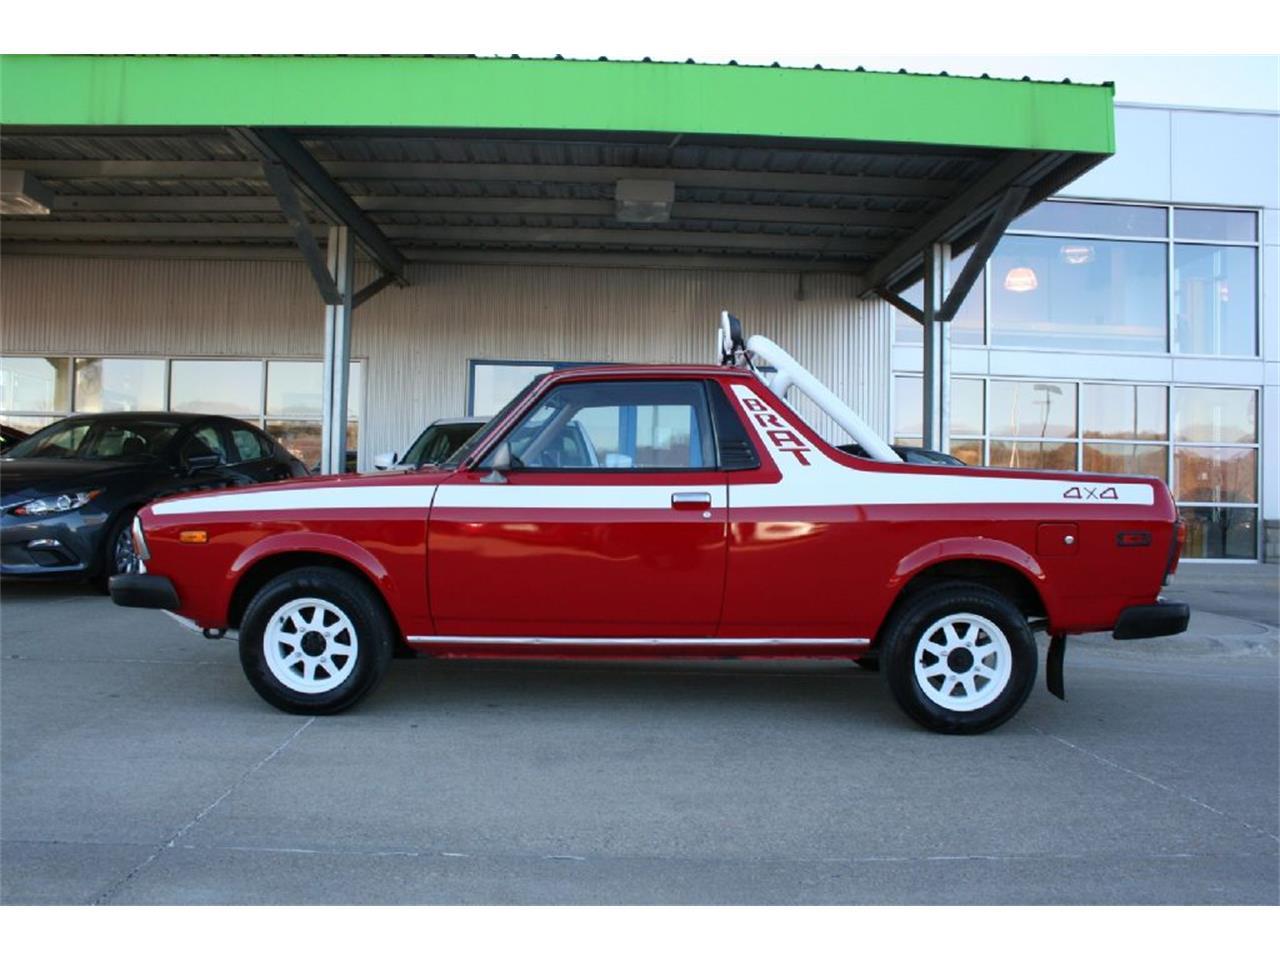 1979 Subaru Brat For Sale Classiccars Com Cc 930455